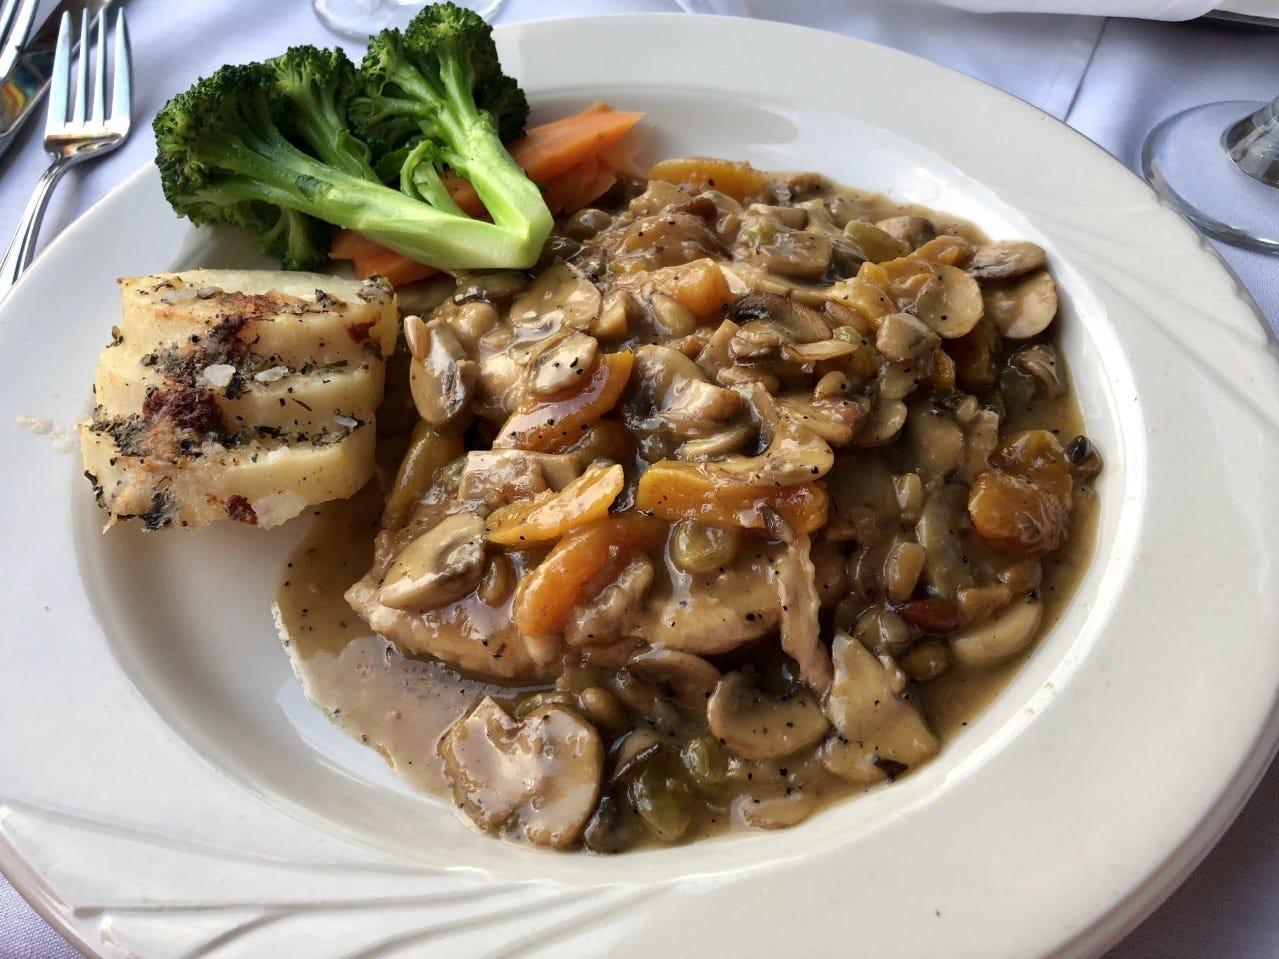 Pollo La Fontanella features porcini mushrooms, apricots, rasins and pine nuts in a brandy demi-glace.